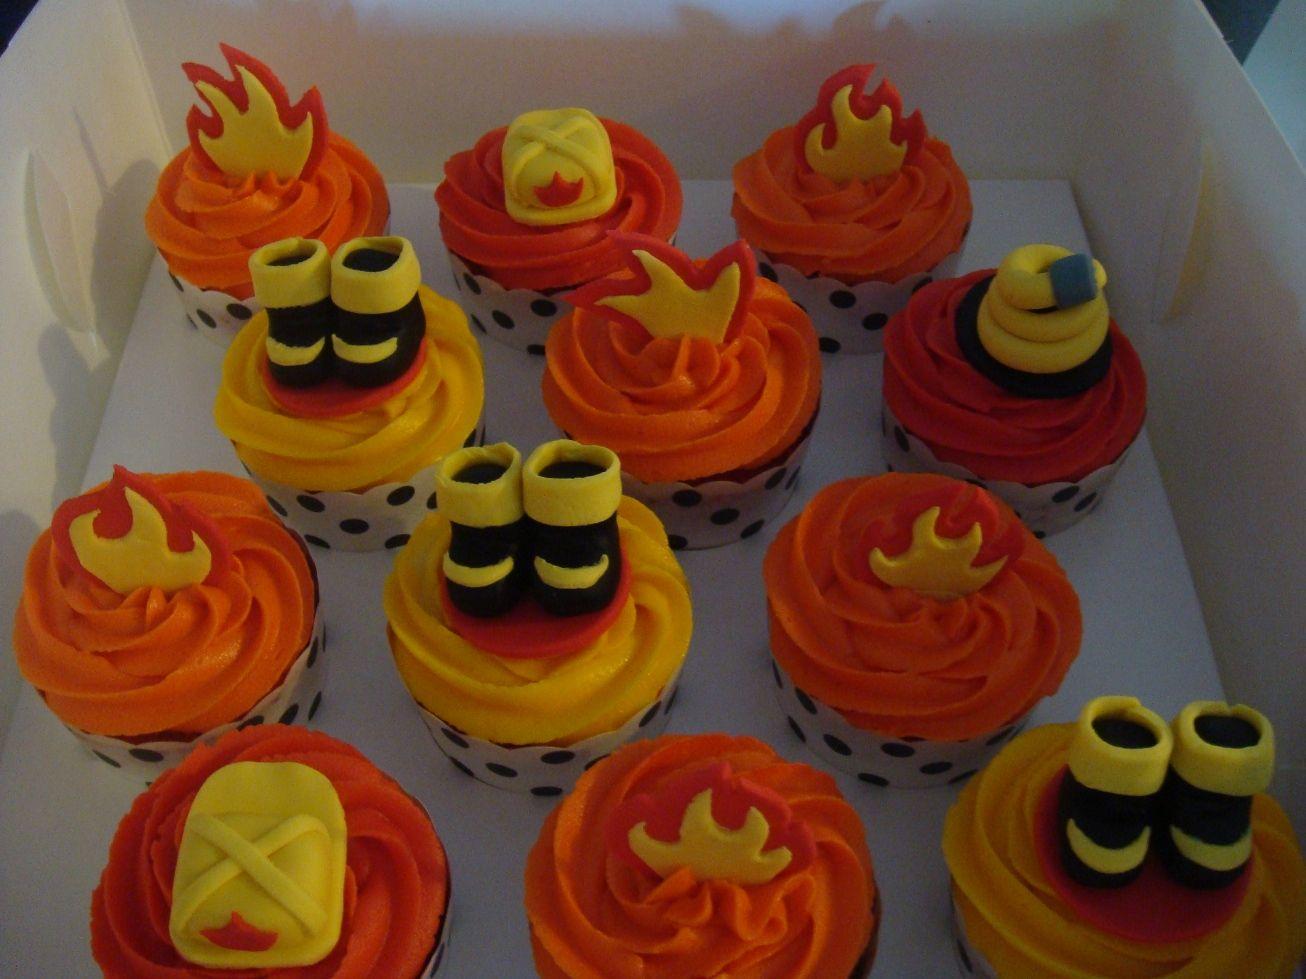 Firefighter Cupcake Decorations 17 Best Ideas About Firefighter Cupcakes On Pinterest Fire Party